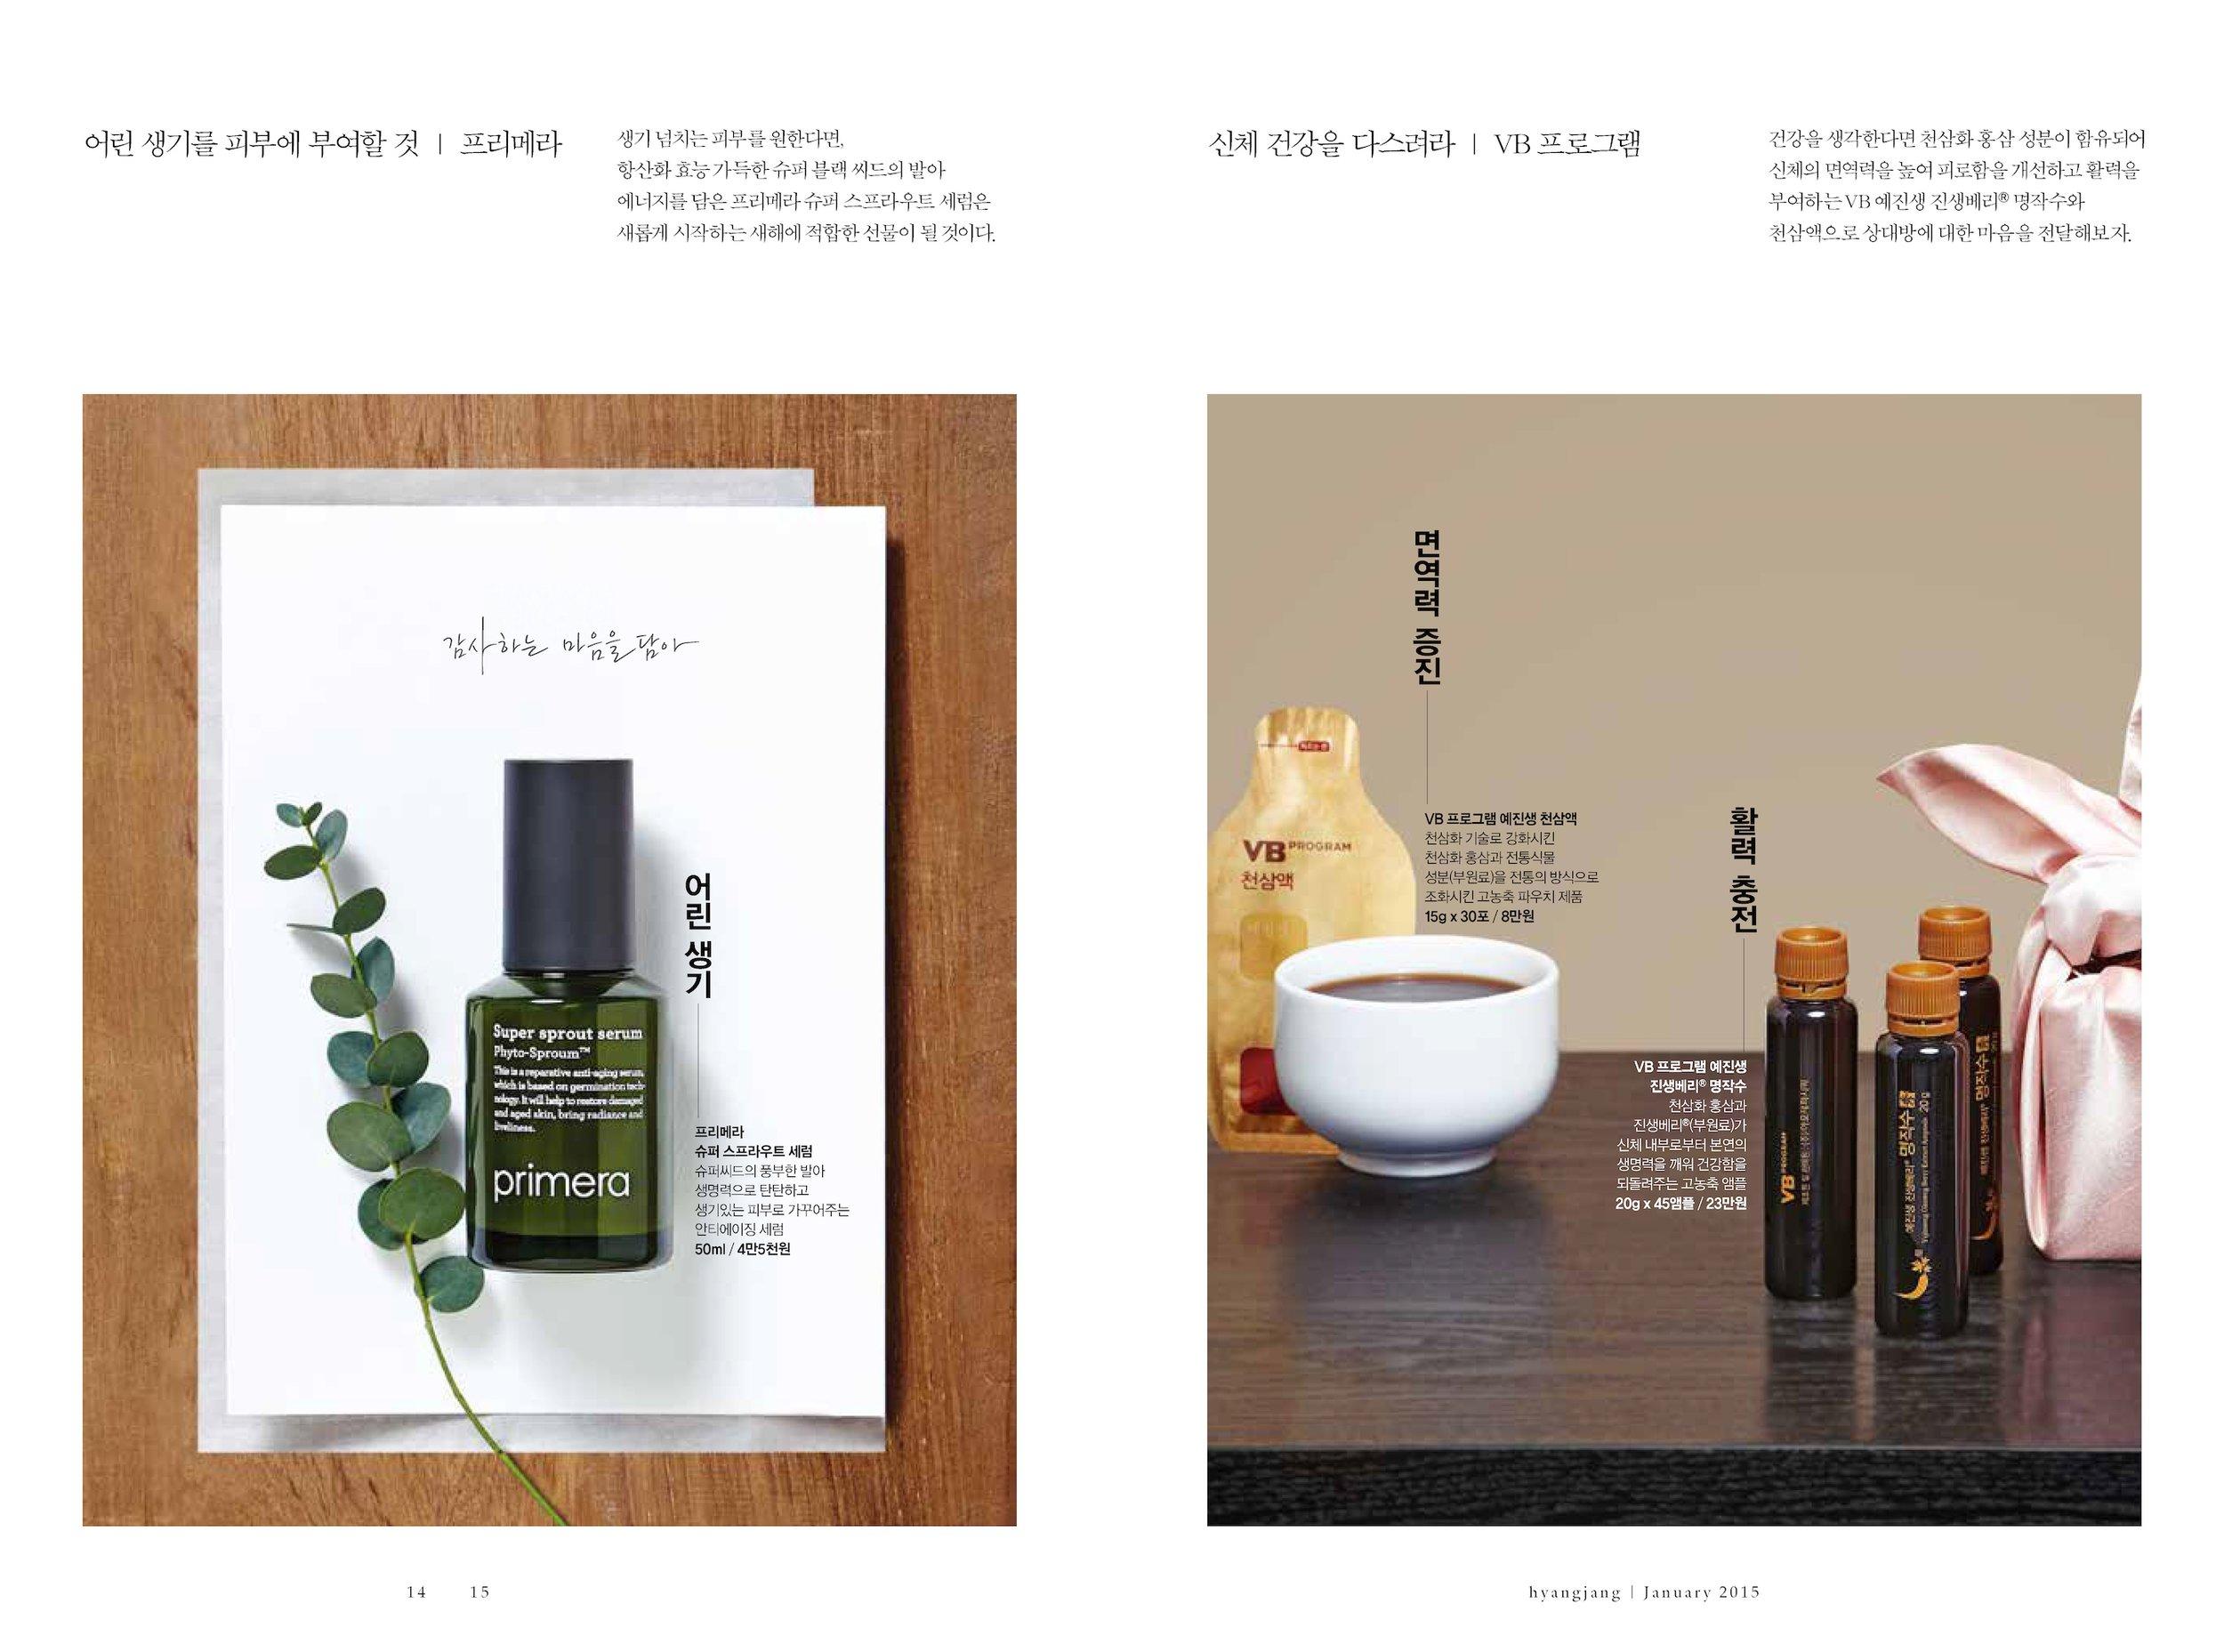 hyangjang-201501_페이지_08.jpeg